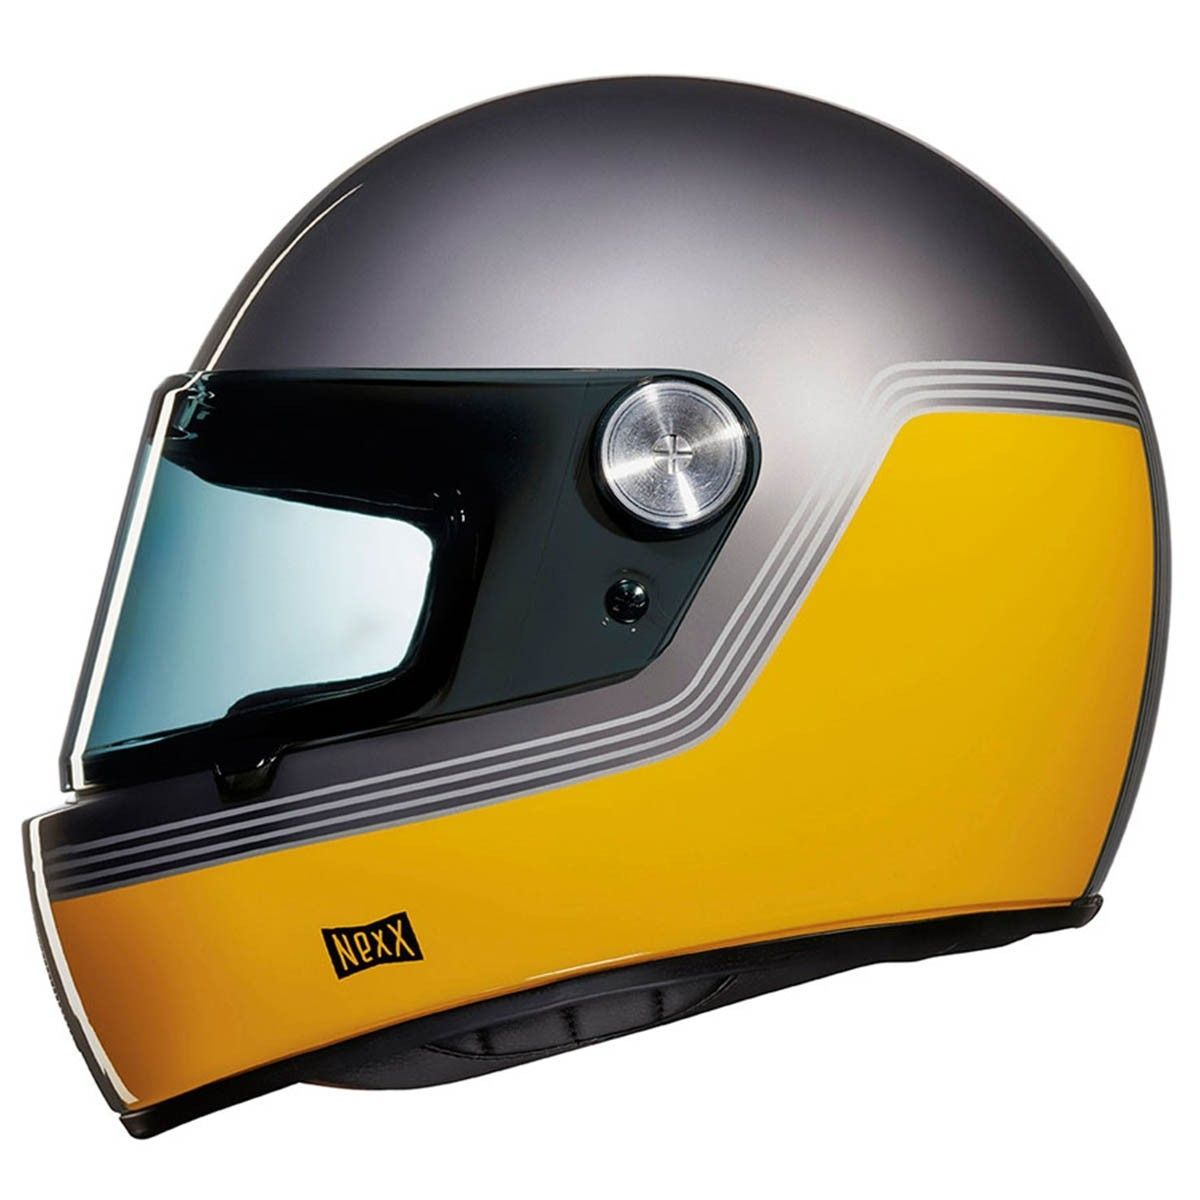 Nexx Xg100r Helmet Motordrome Yellow Side Motorcyclesgear Retro Motorcycle Helmets Motorcycle Helmets Retro Motorcycle